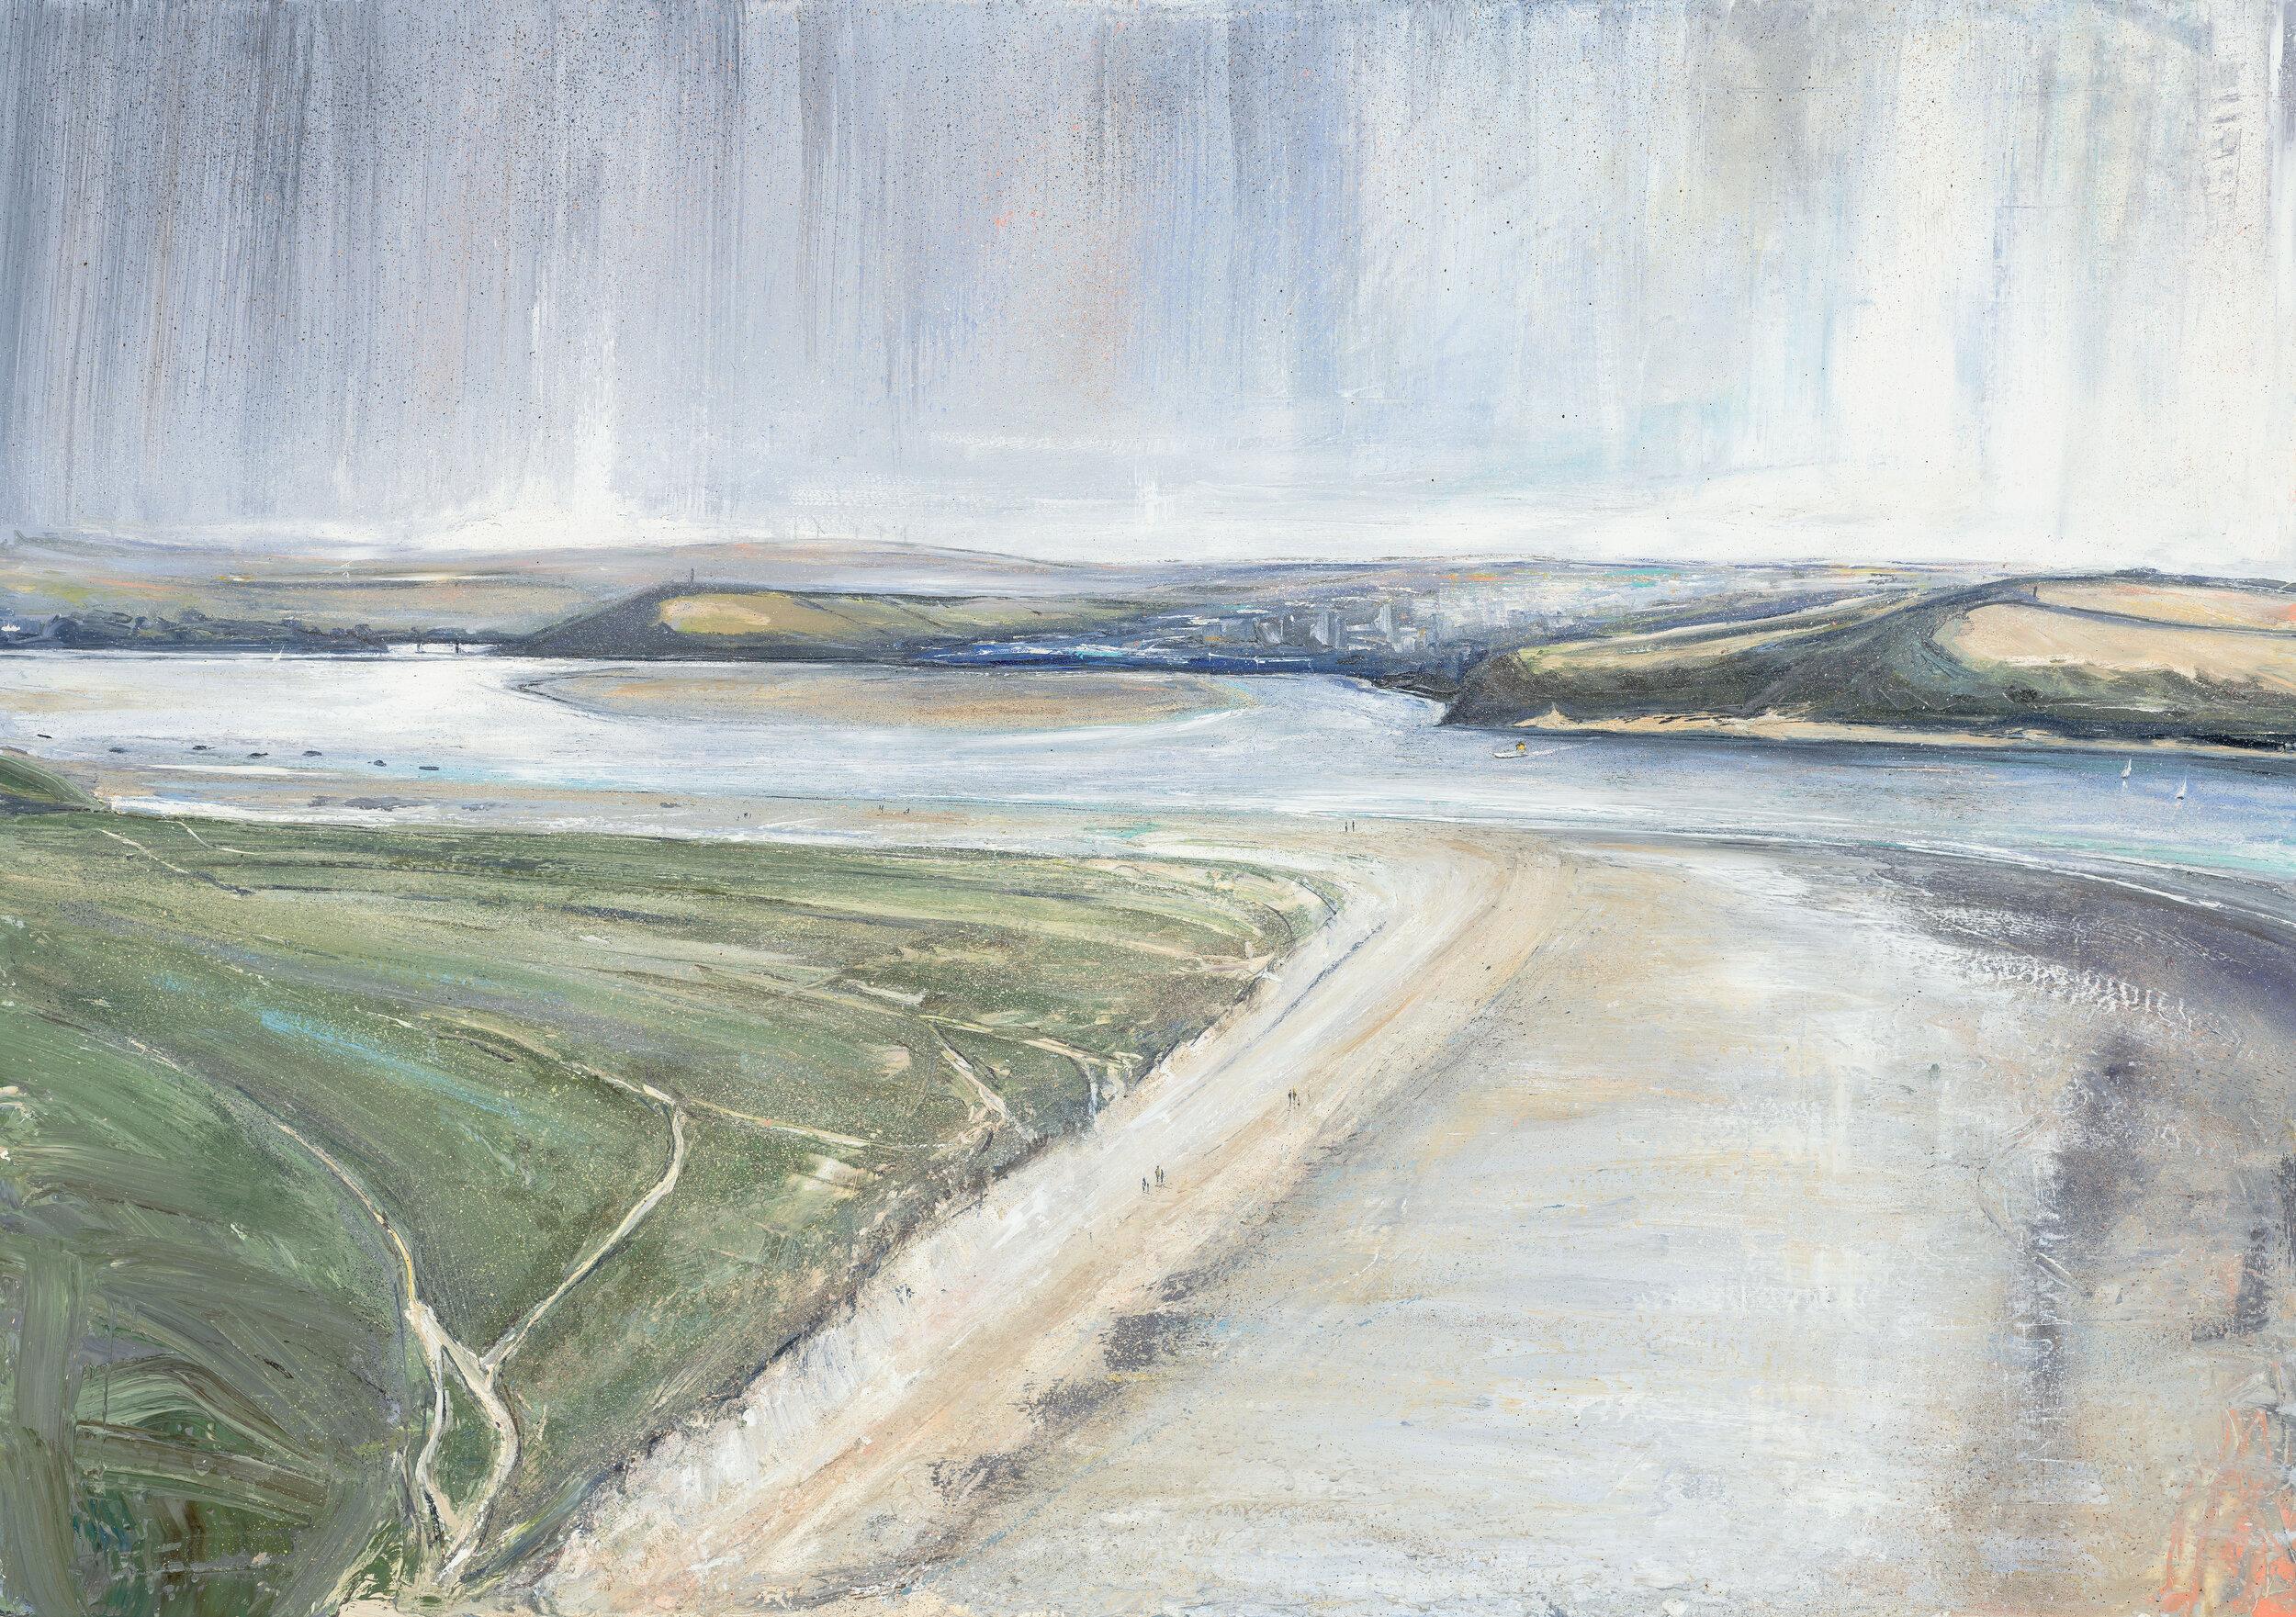 Jethro Jackson Looking Down from Brea Hill  Oil on Board  100 x 70cm  £4895.00